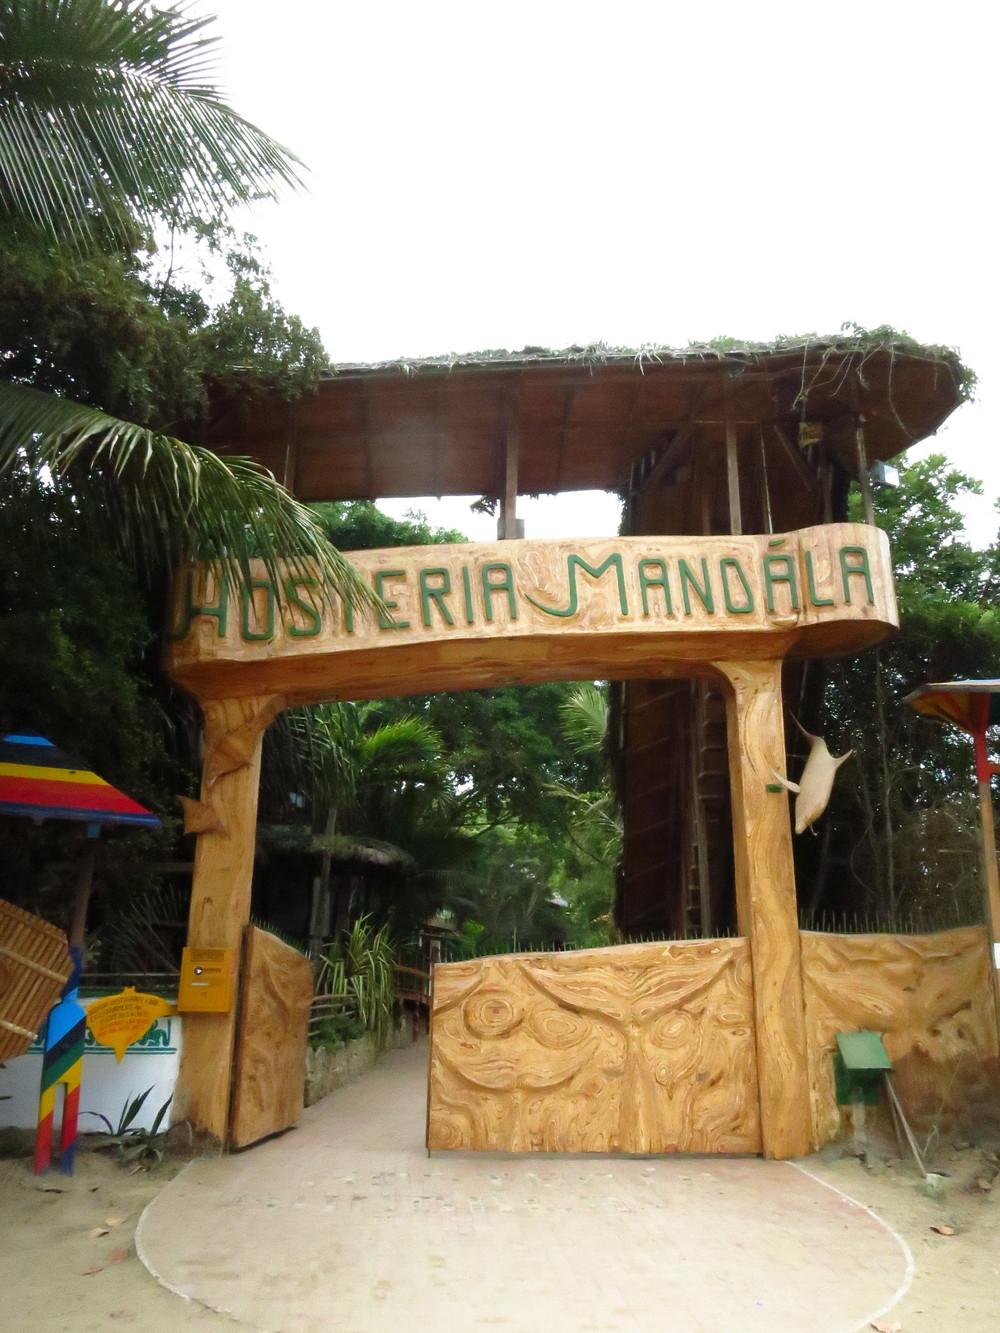 The gorgeous entrance to Hosteria Mandala